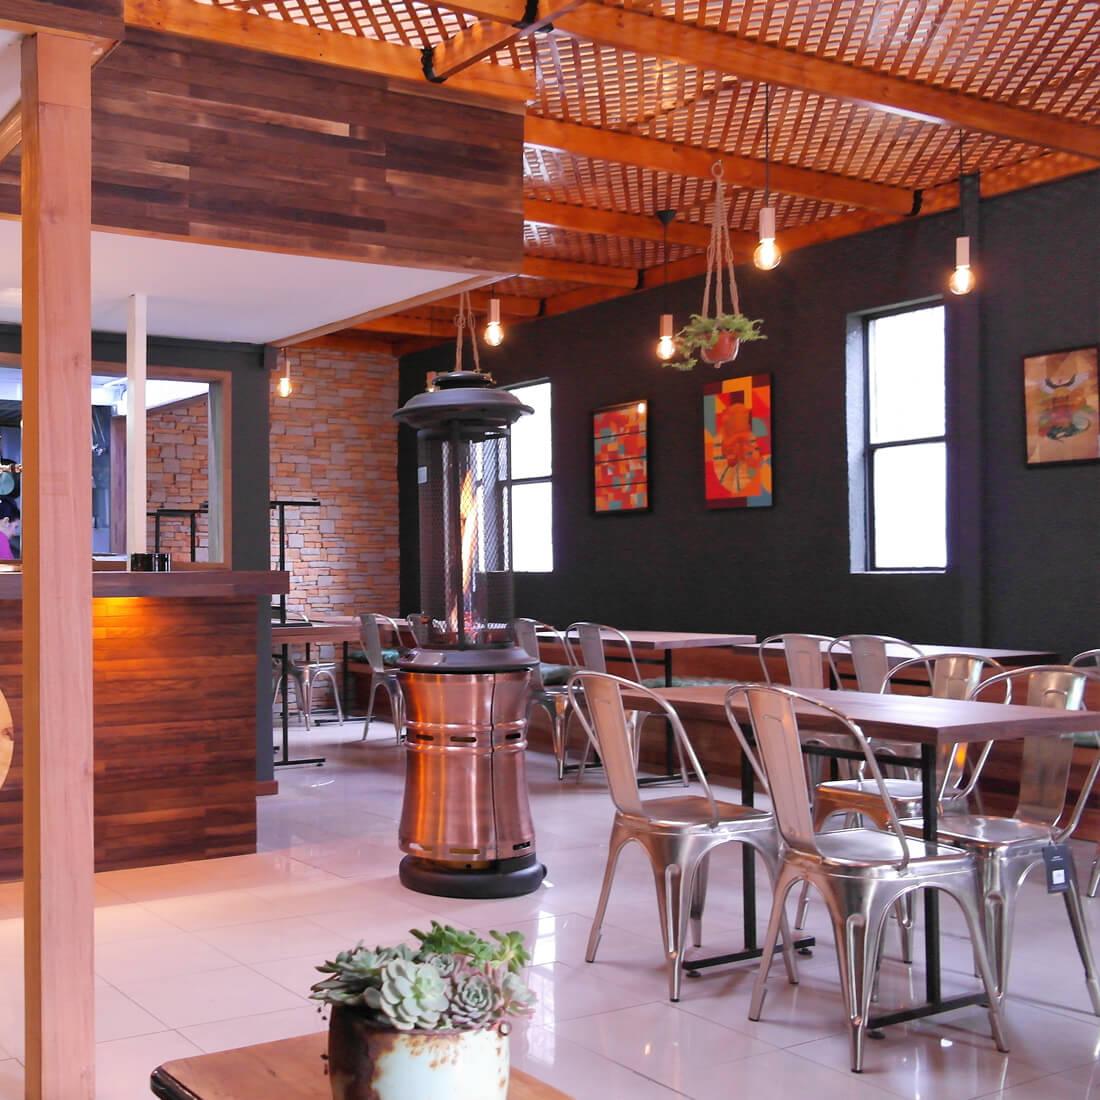 VERDE SAZóN Restaurante - Reserva en restaurantes de Comida FUSIóN - PROVIDENCIA - MESA 24/7 | SANTIAGO - Perú